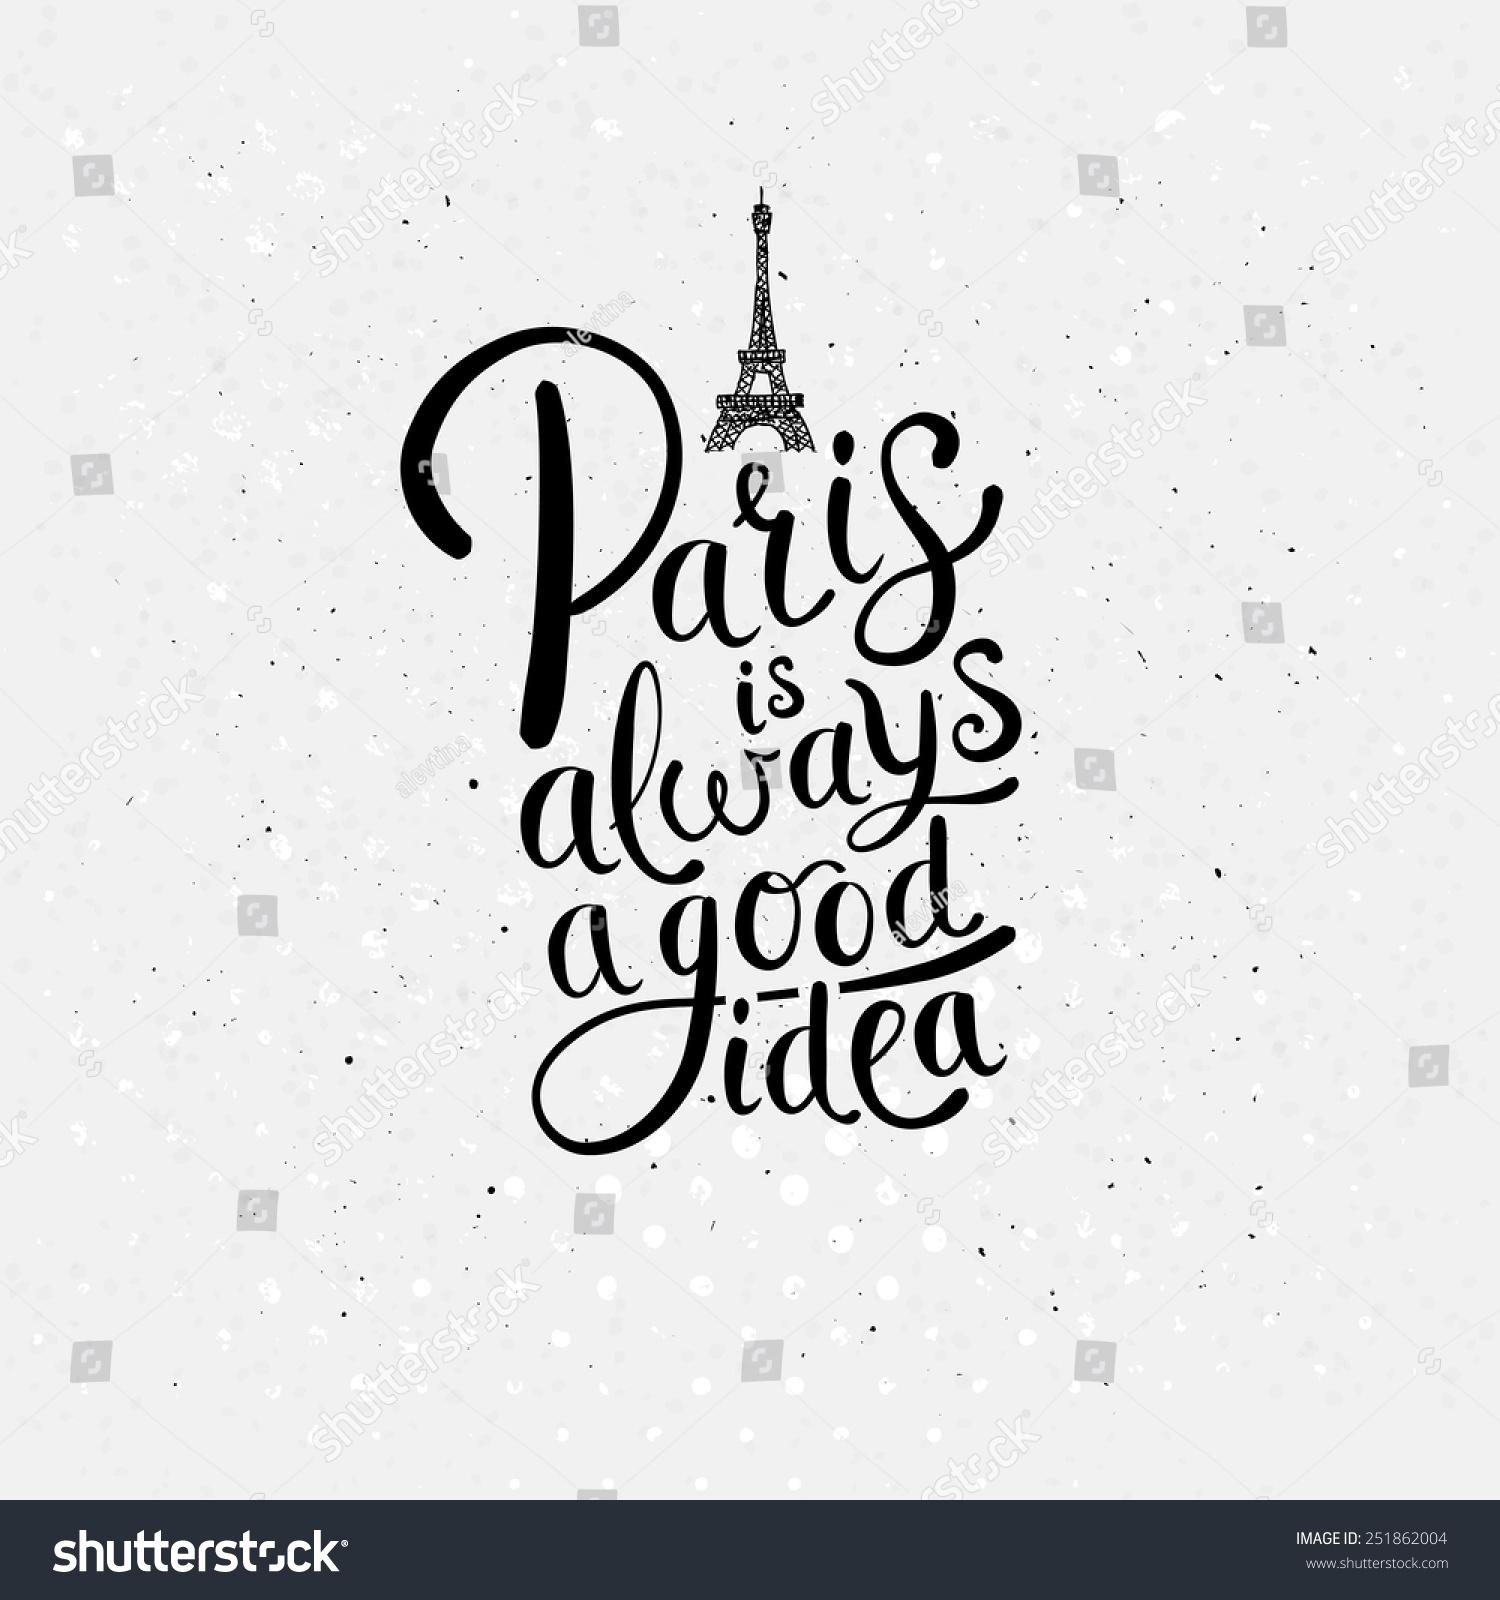 A Paris Apartment And A Paris Graphic: Simple Graphic Design Paris Always Good Stock Vector